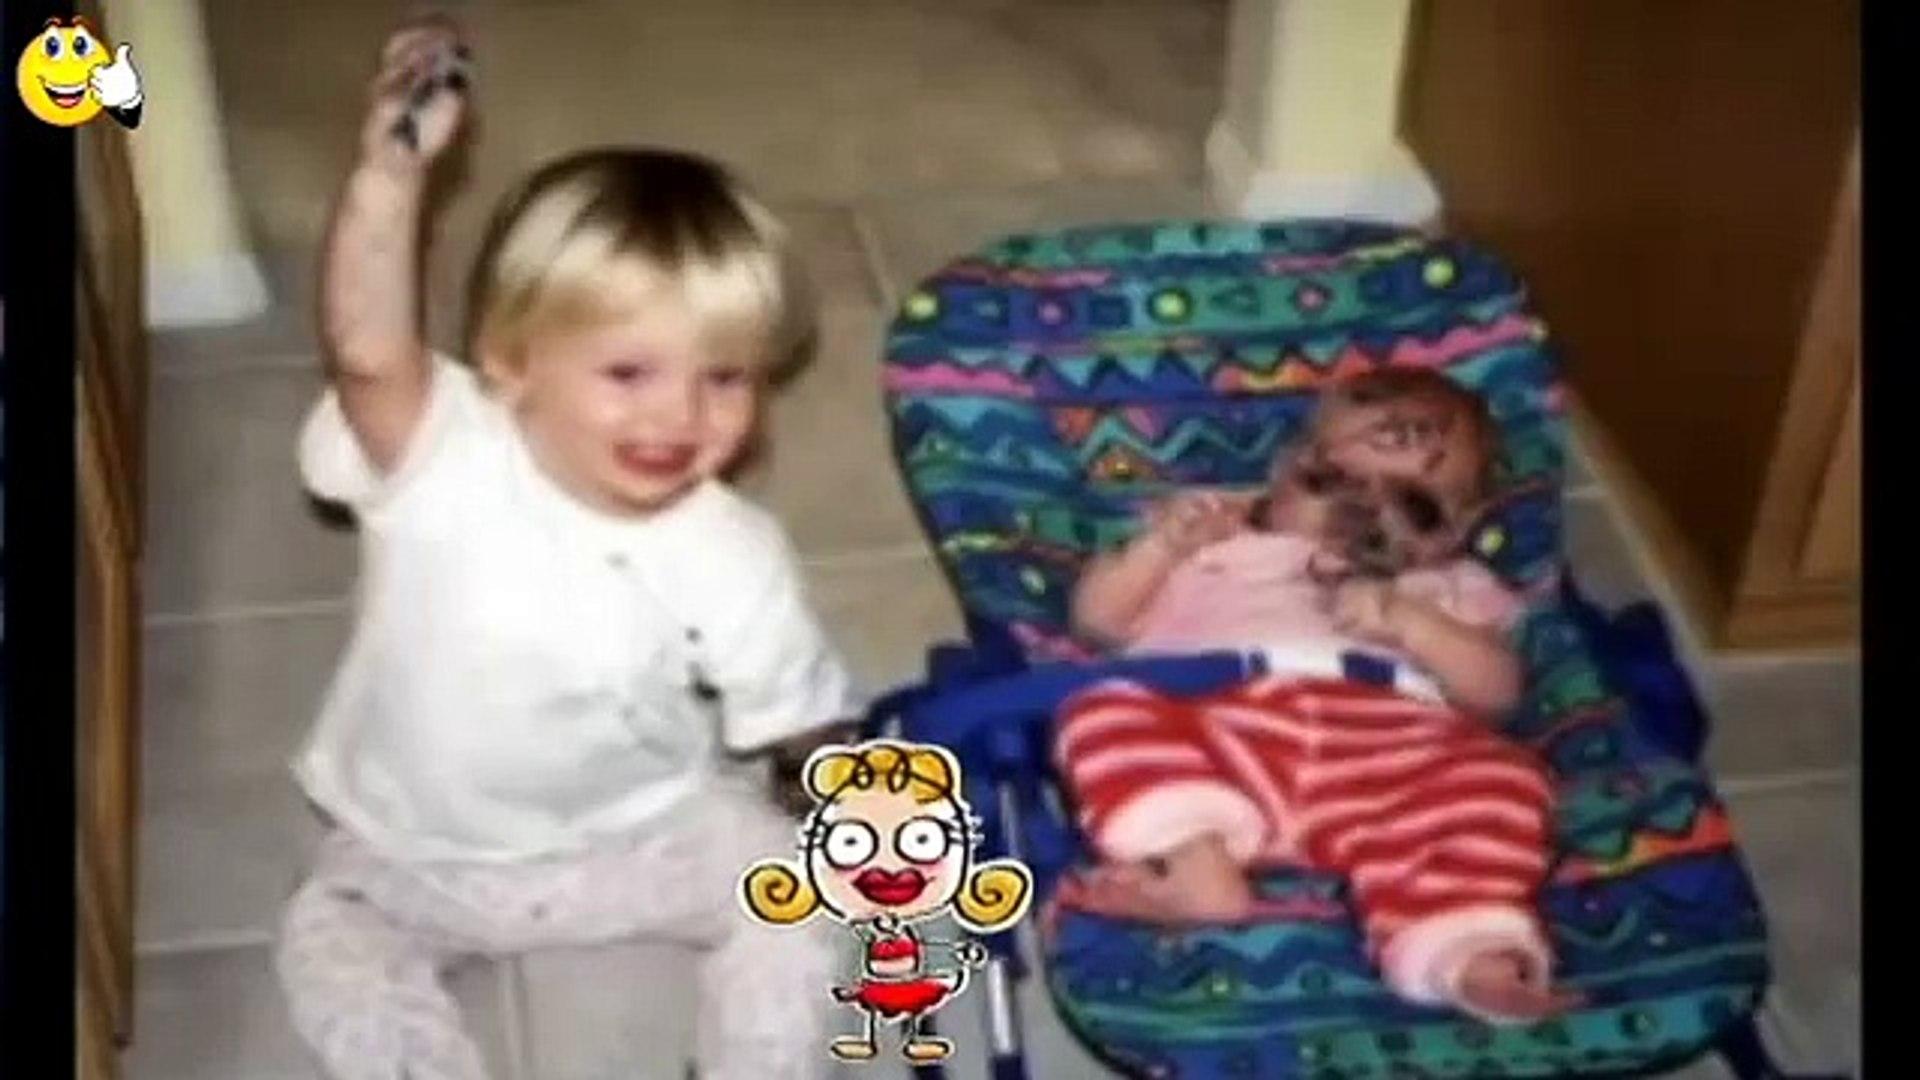 BABIES LAUGH MASHUP SONG - LAUGHING SODA